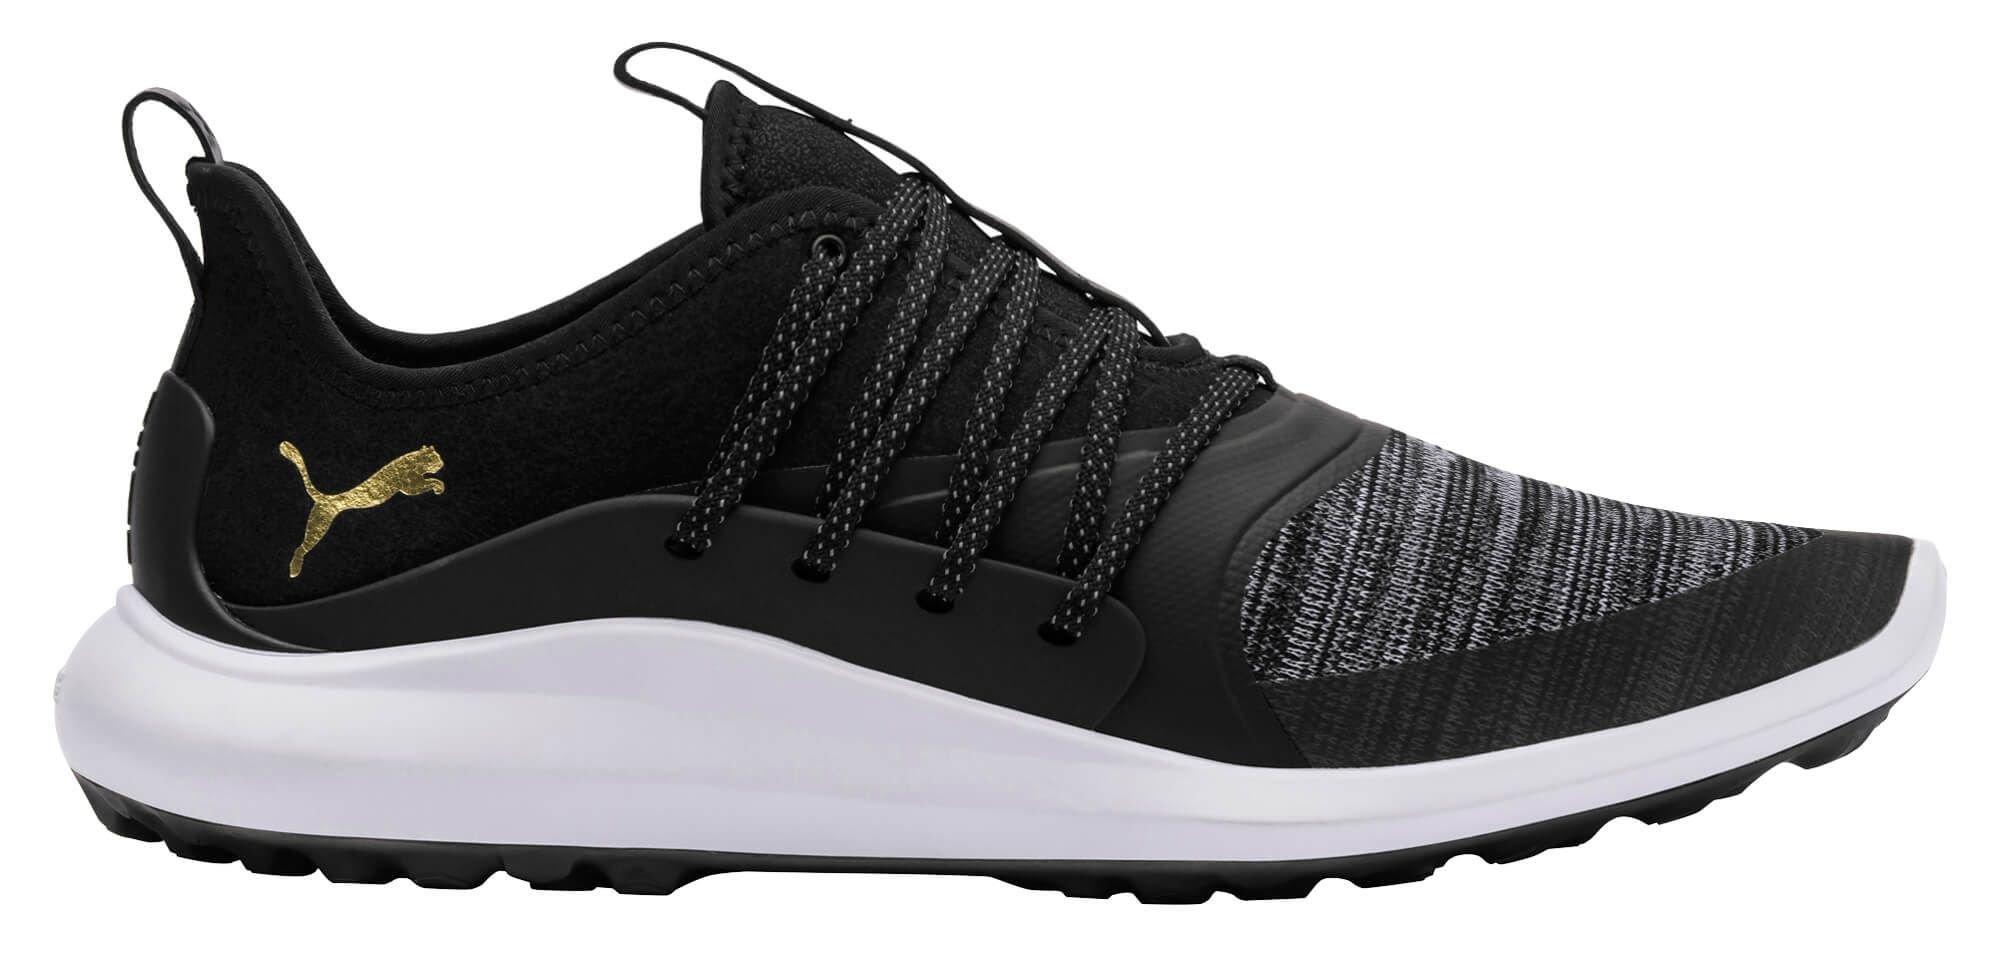 Puma Ignite Nxt Solelace Golf Shoes Black Team Gold Carl S Golfland